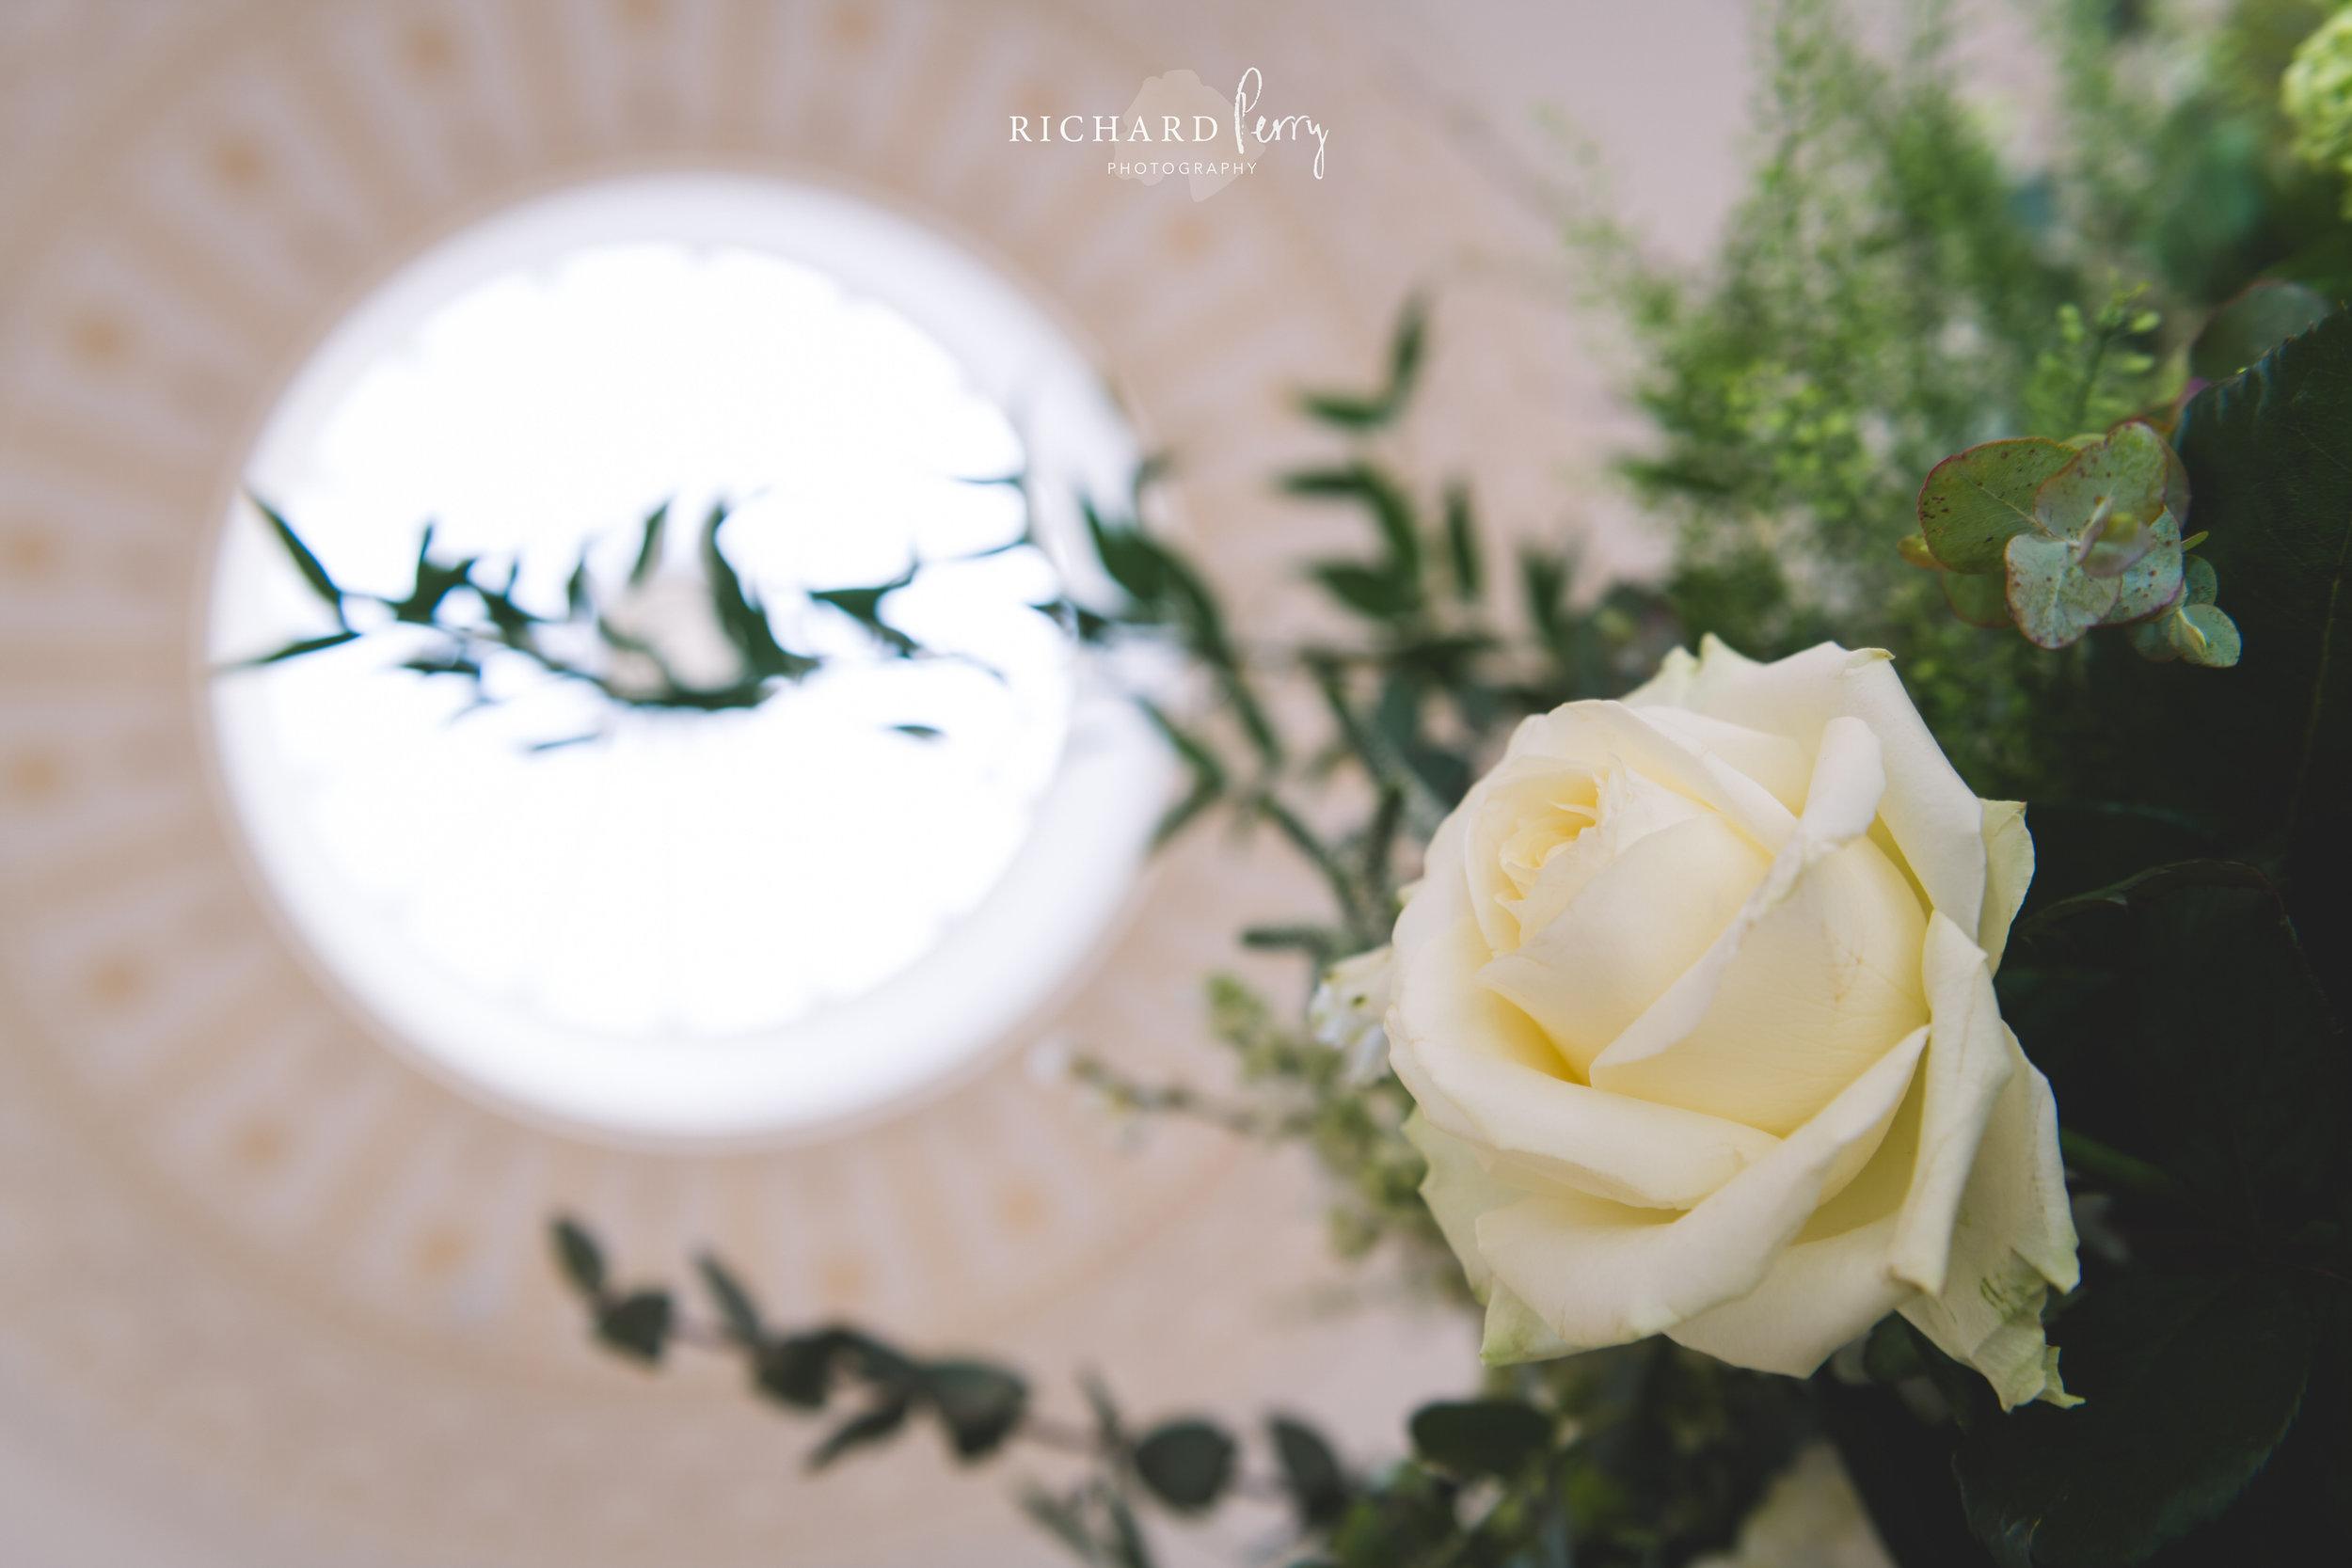 yorkshire-wedding-photographer-destination-archerfield-house-4.jpg